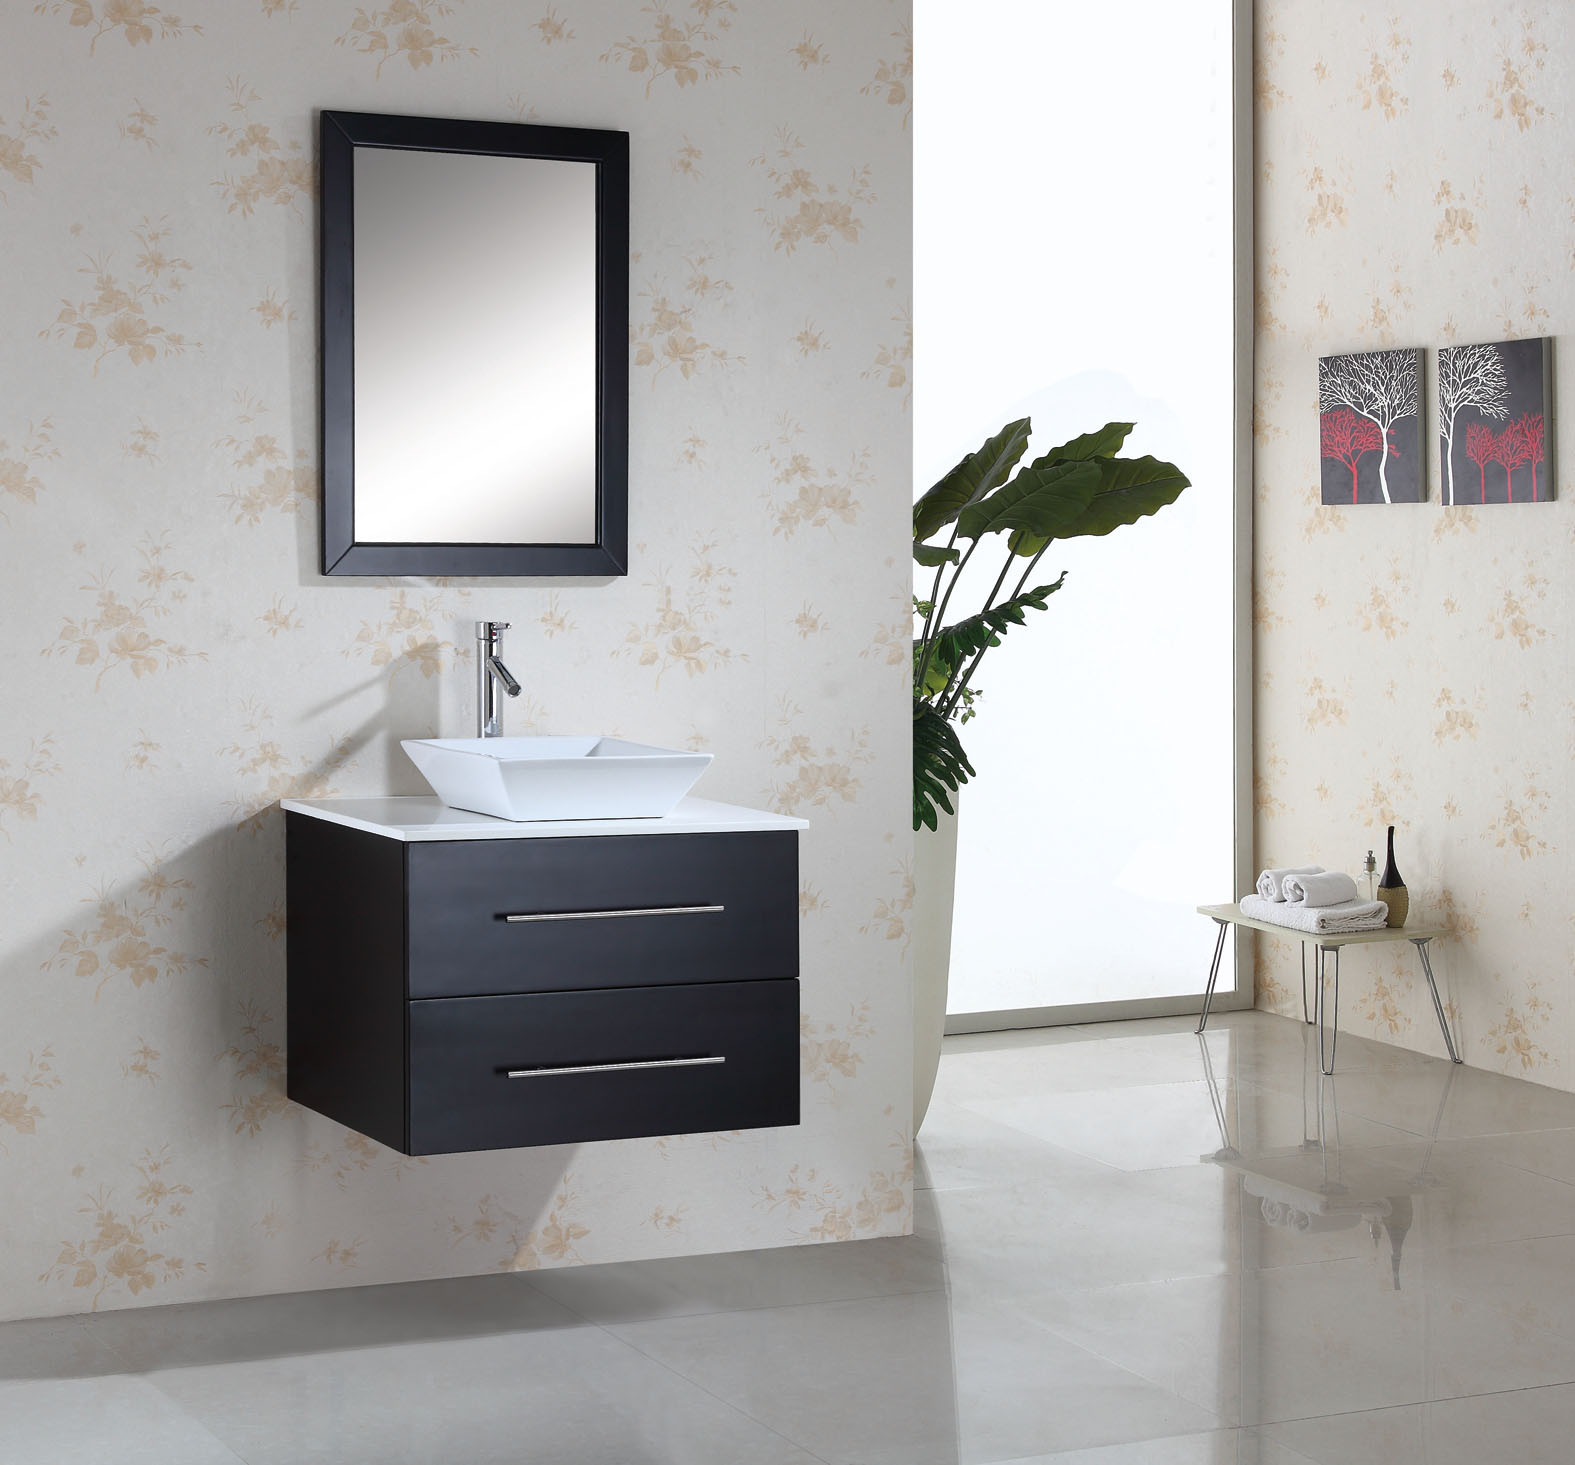 virtu usa marsala (single) inch modern wall mount bathroom  - virtu usa marsala (single) inch modern wall mount bathroom vanity set espresso